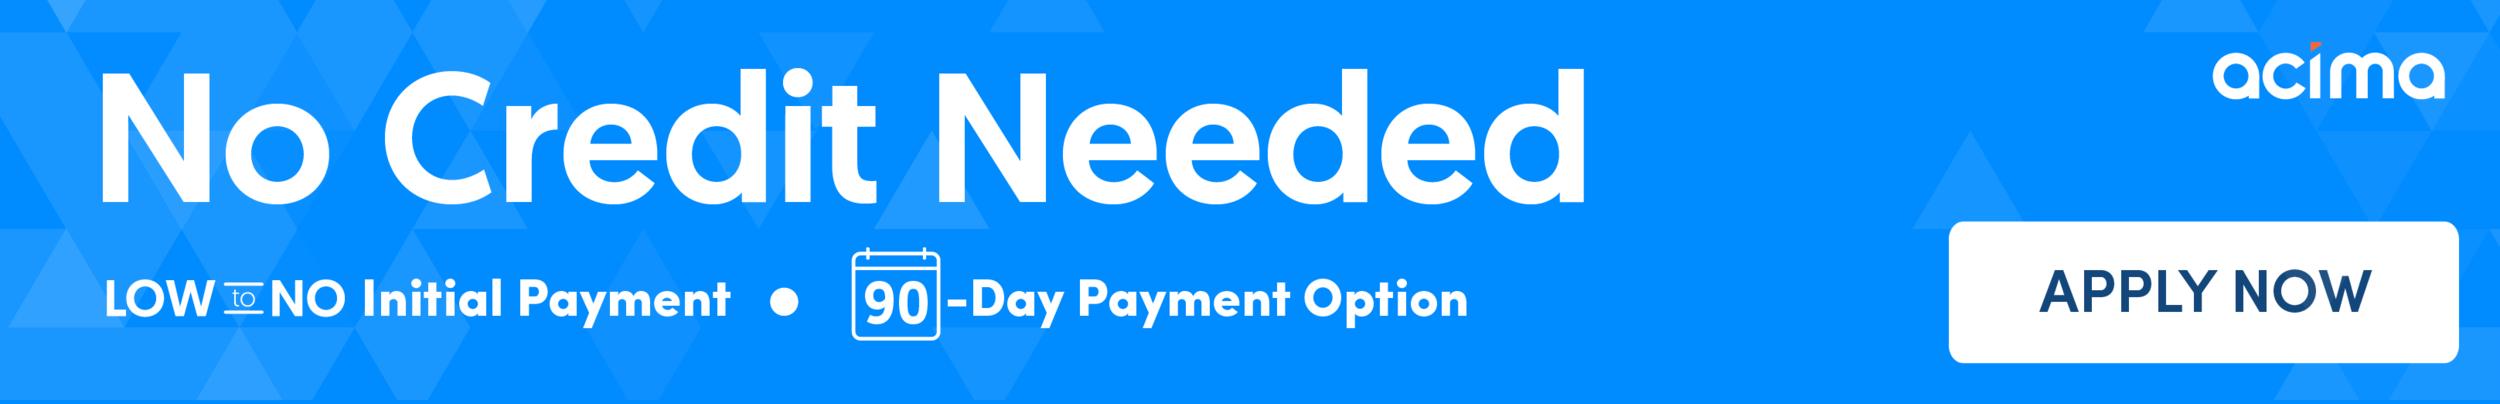 https://www.img-media.net/customer/leases/new?merchant_id=90D28A